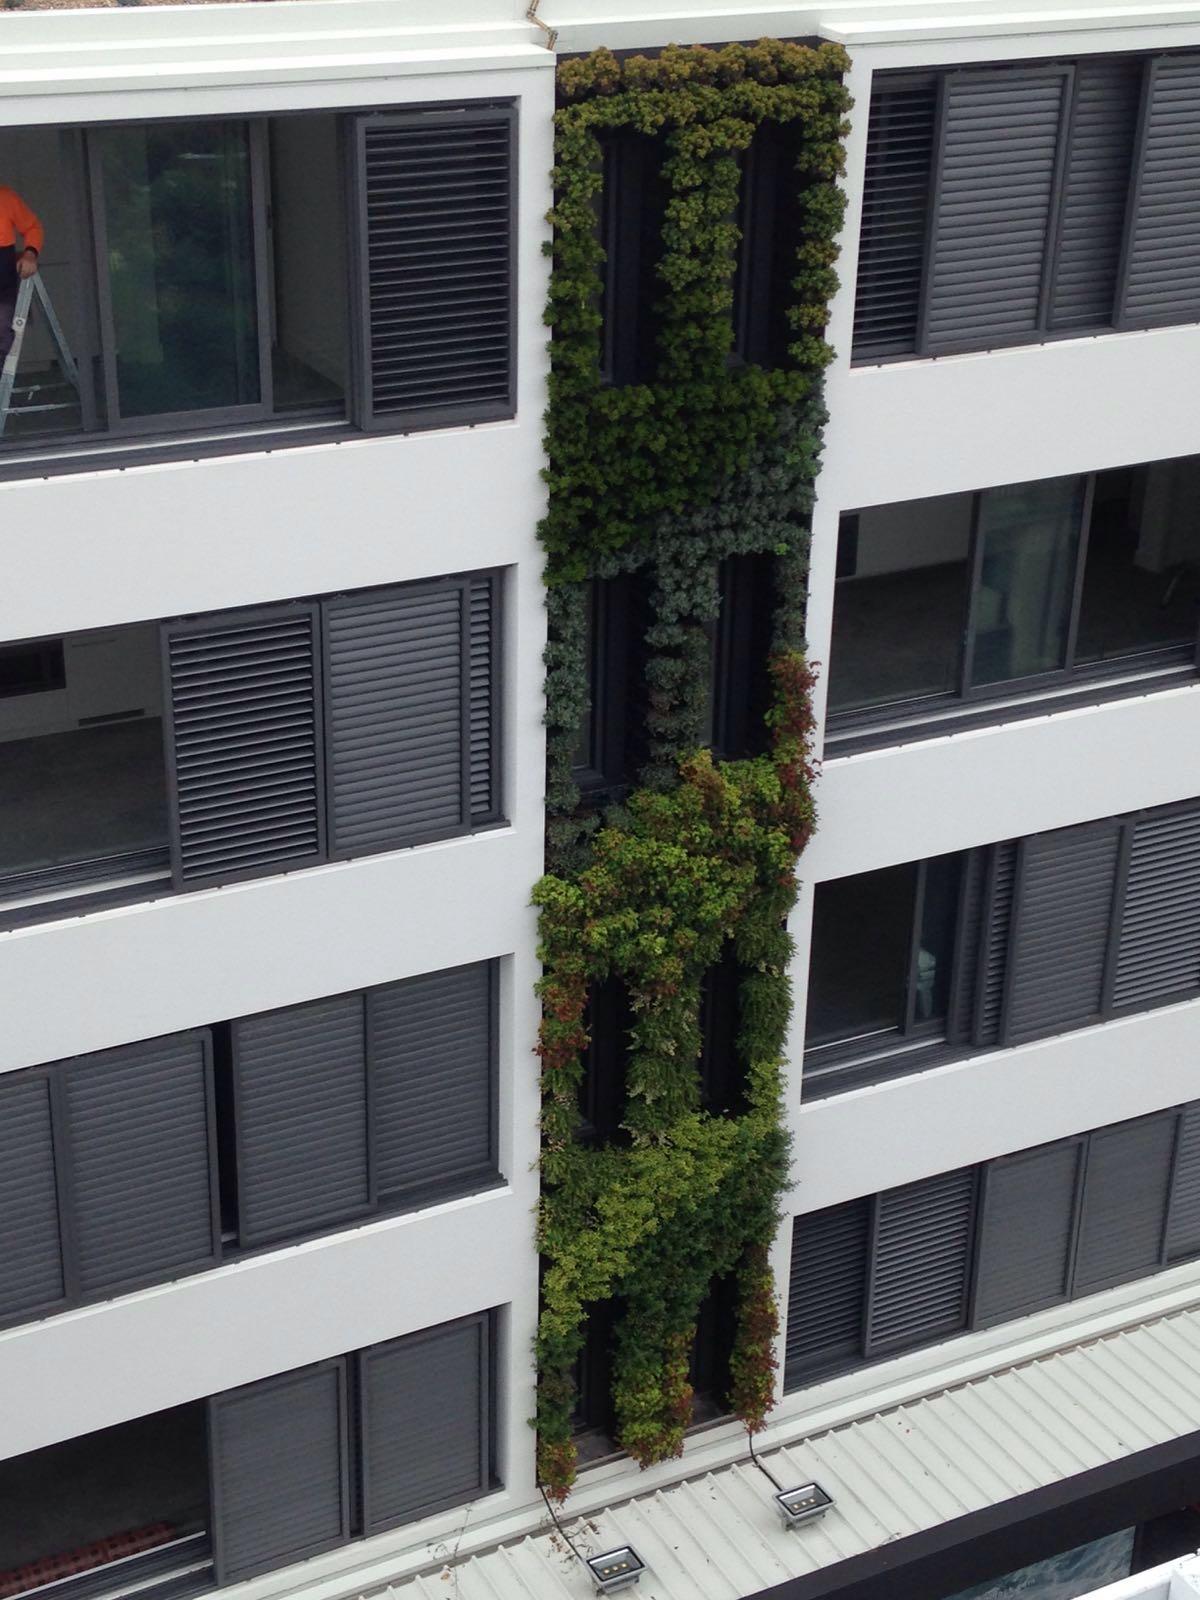 Green Wall Vertical Garden Installation Bondi Beach Australia